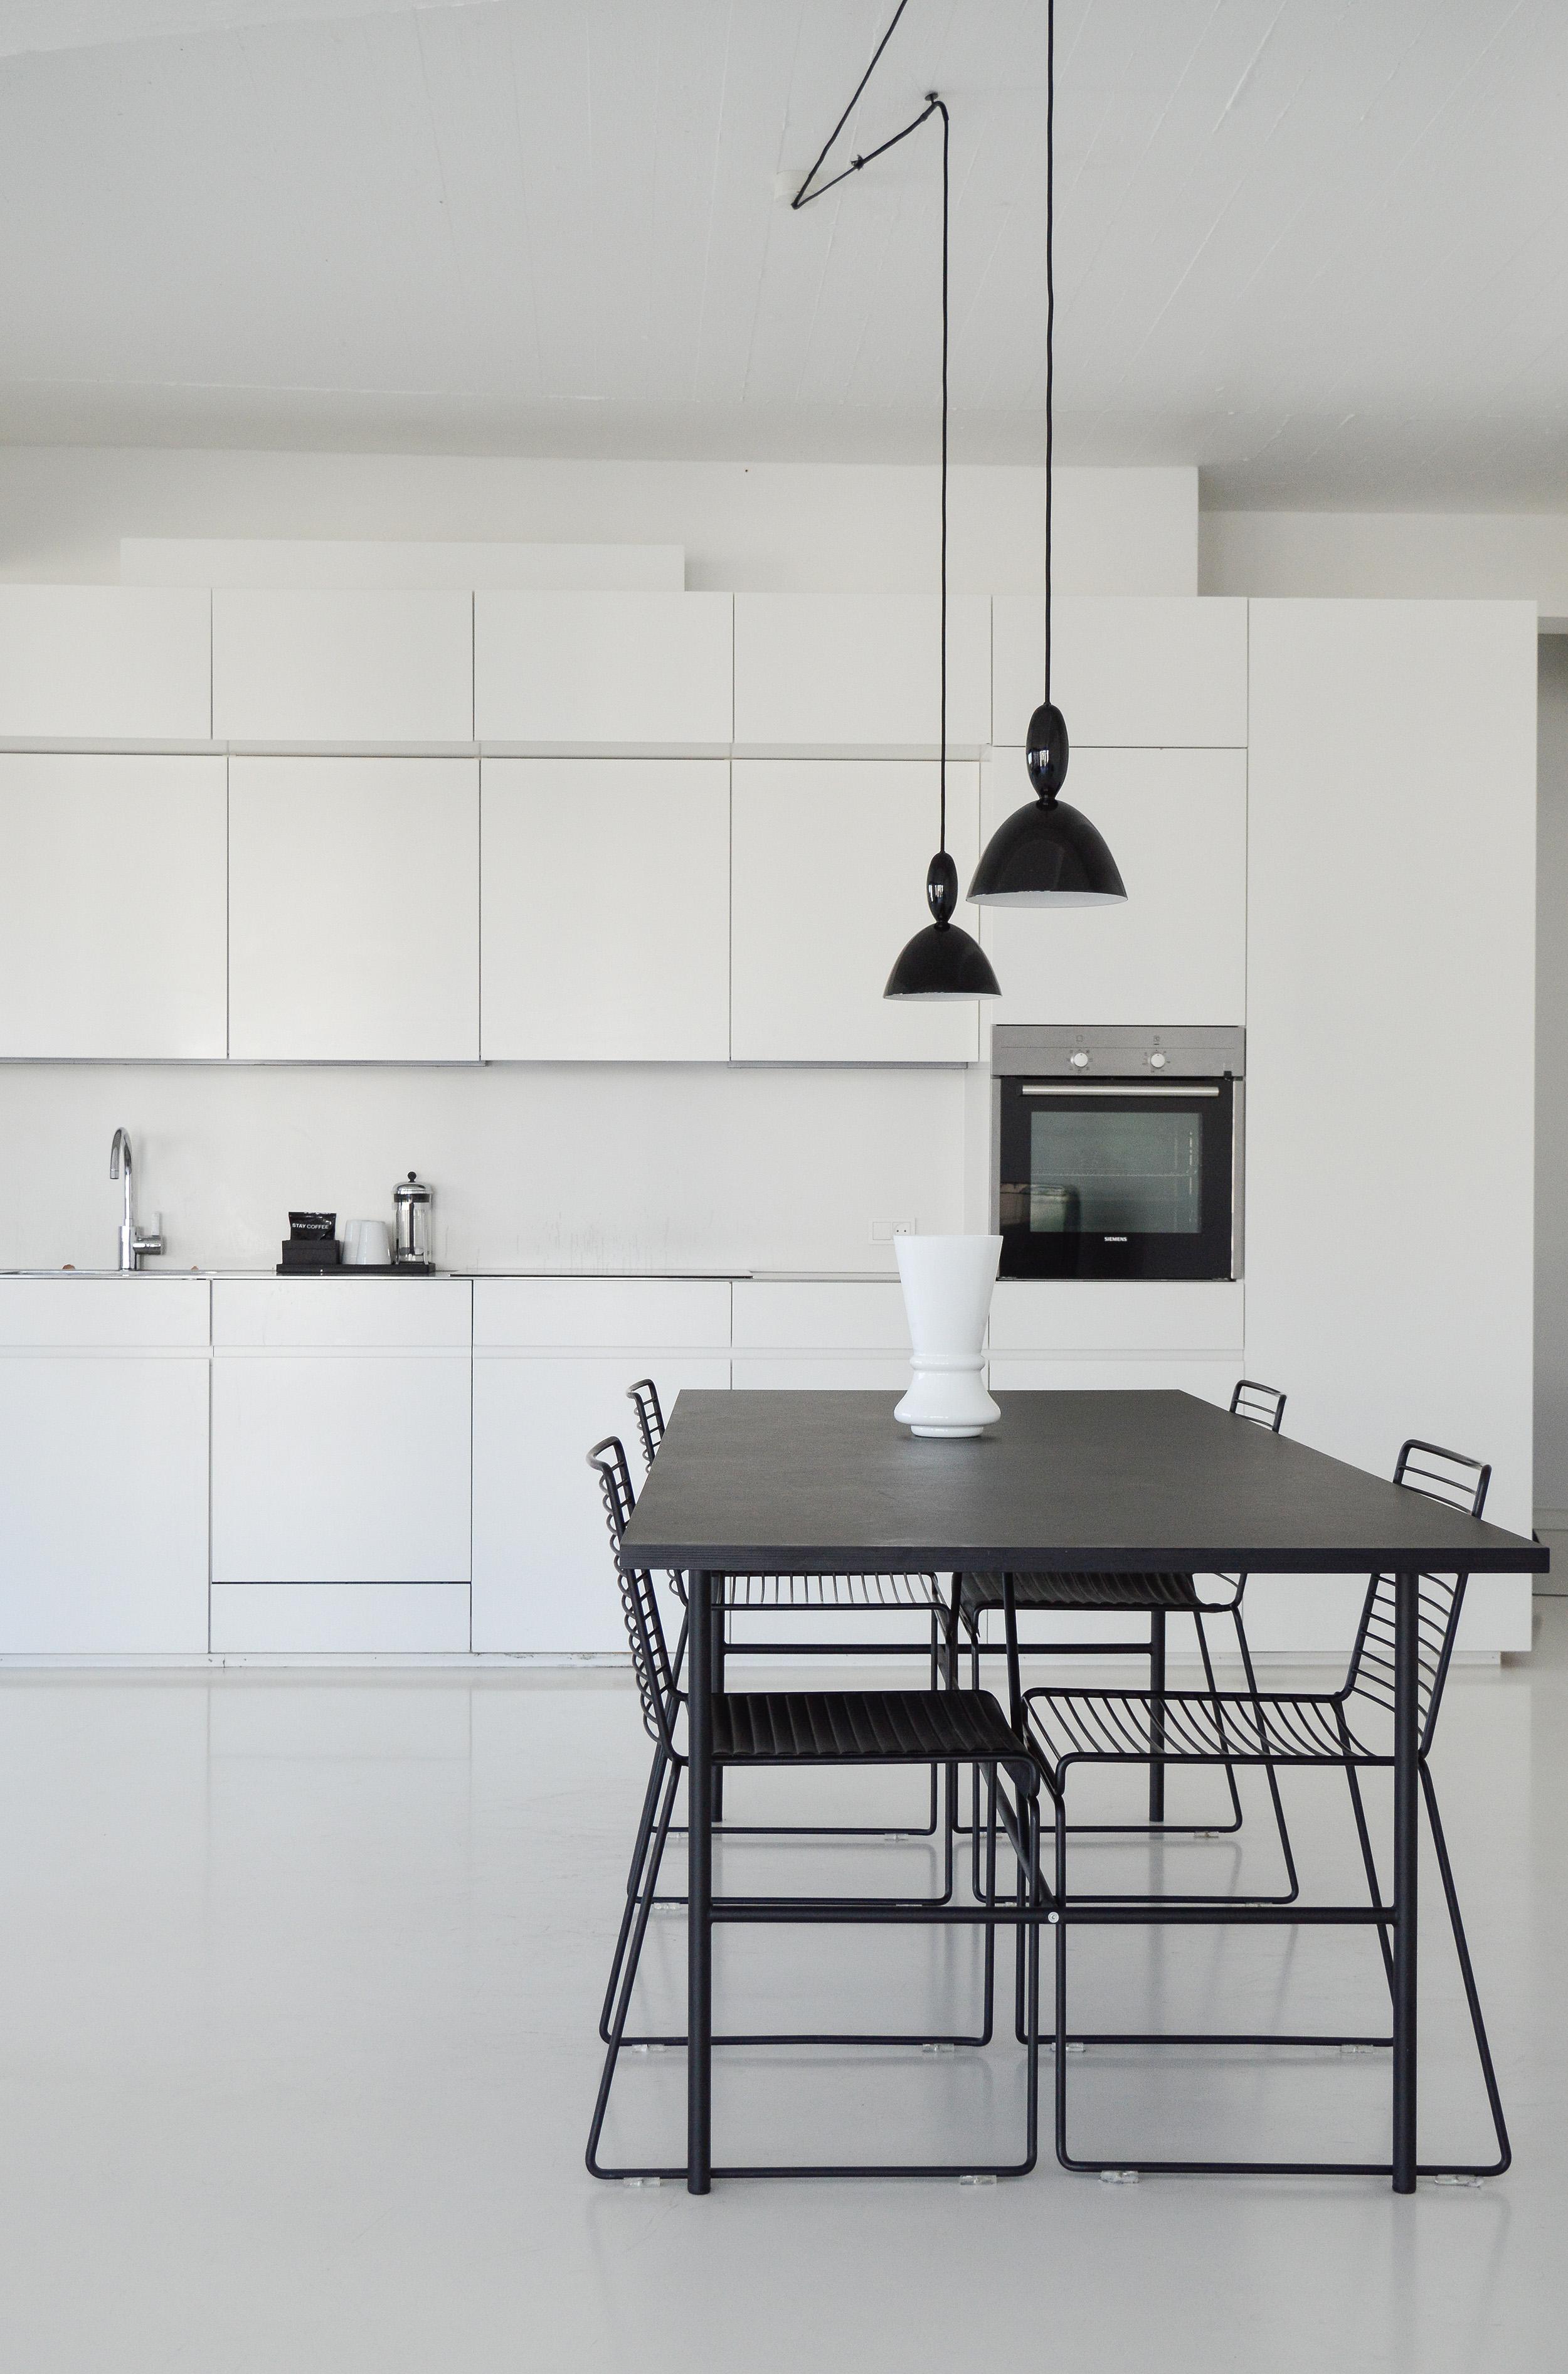 A Scandinavian minimalist kitchen